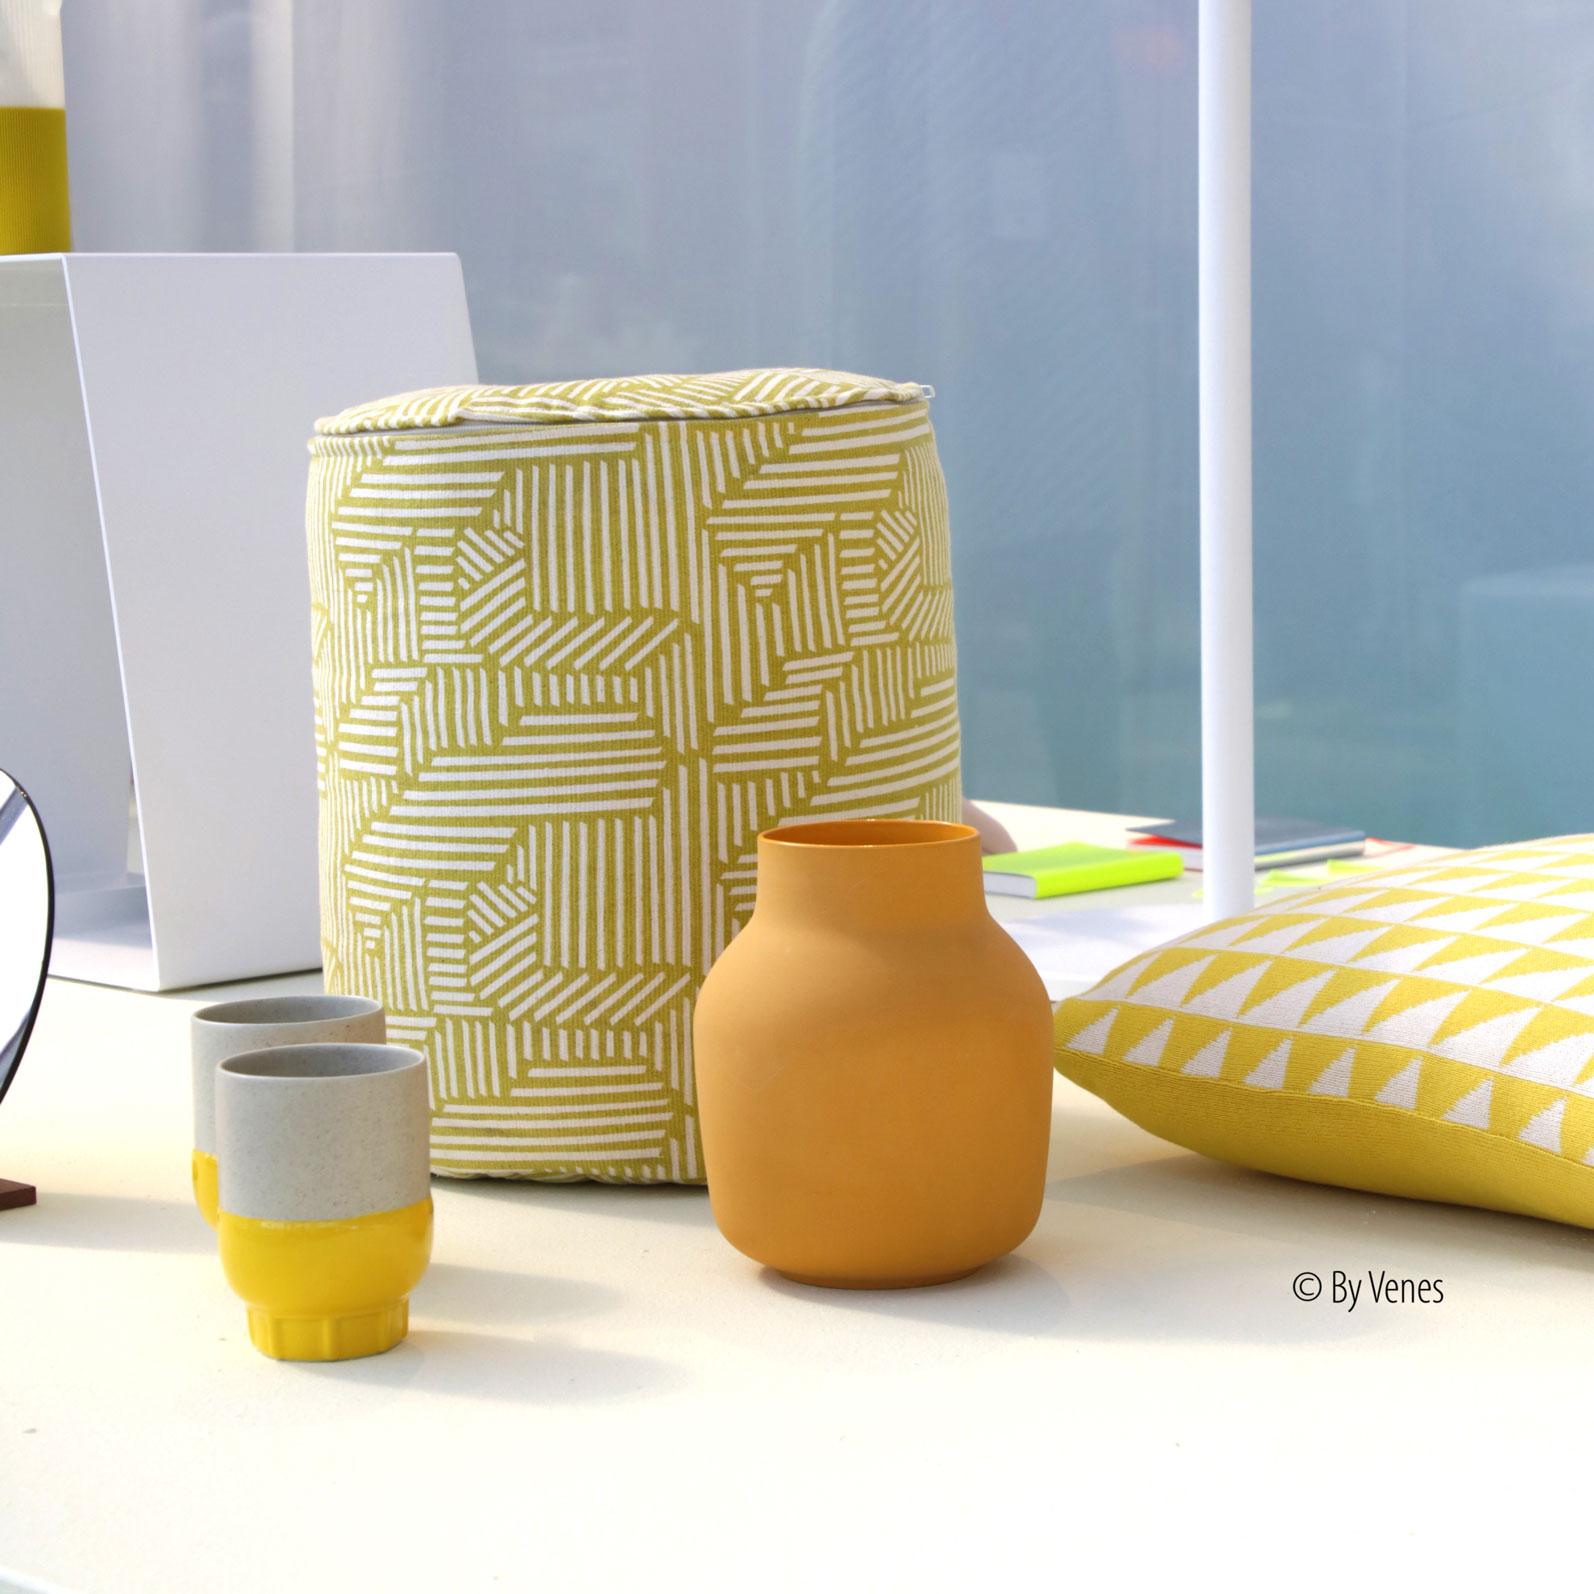 Poef aardewerk sierkussen geel terracotta. Interieur accessoires